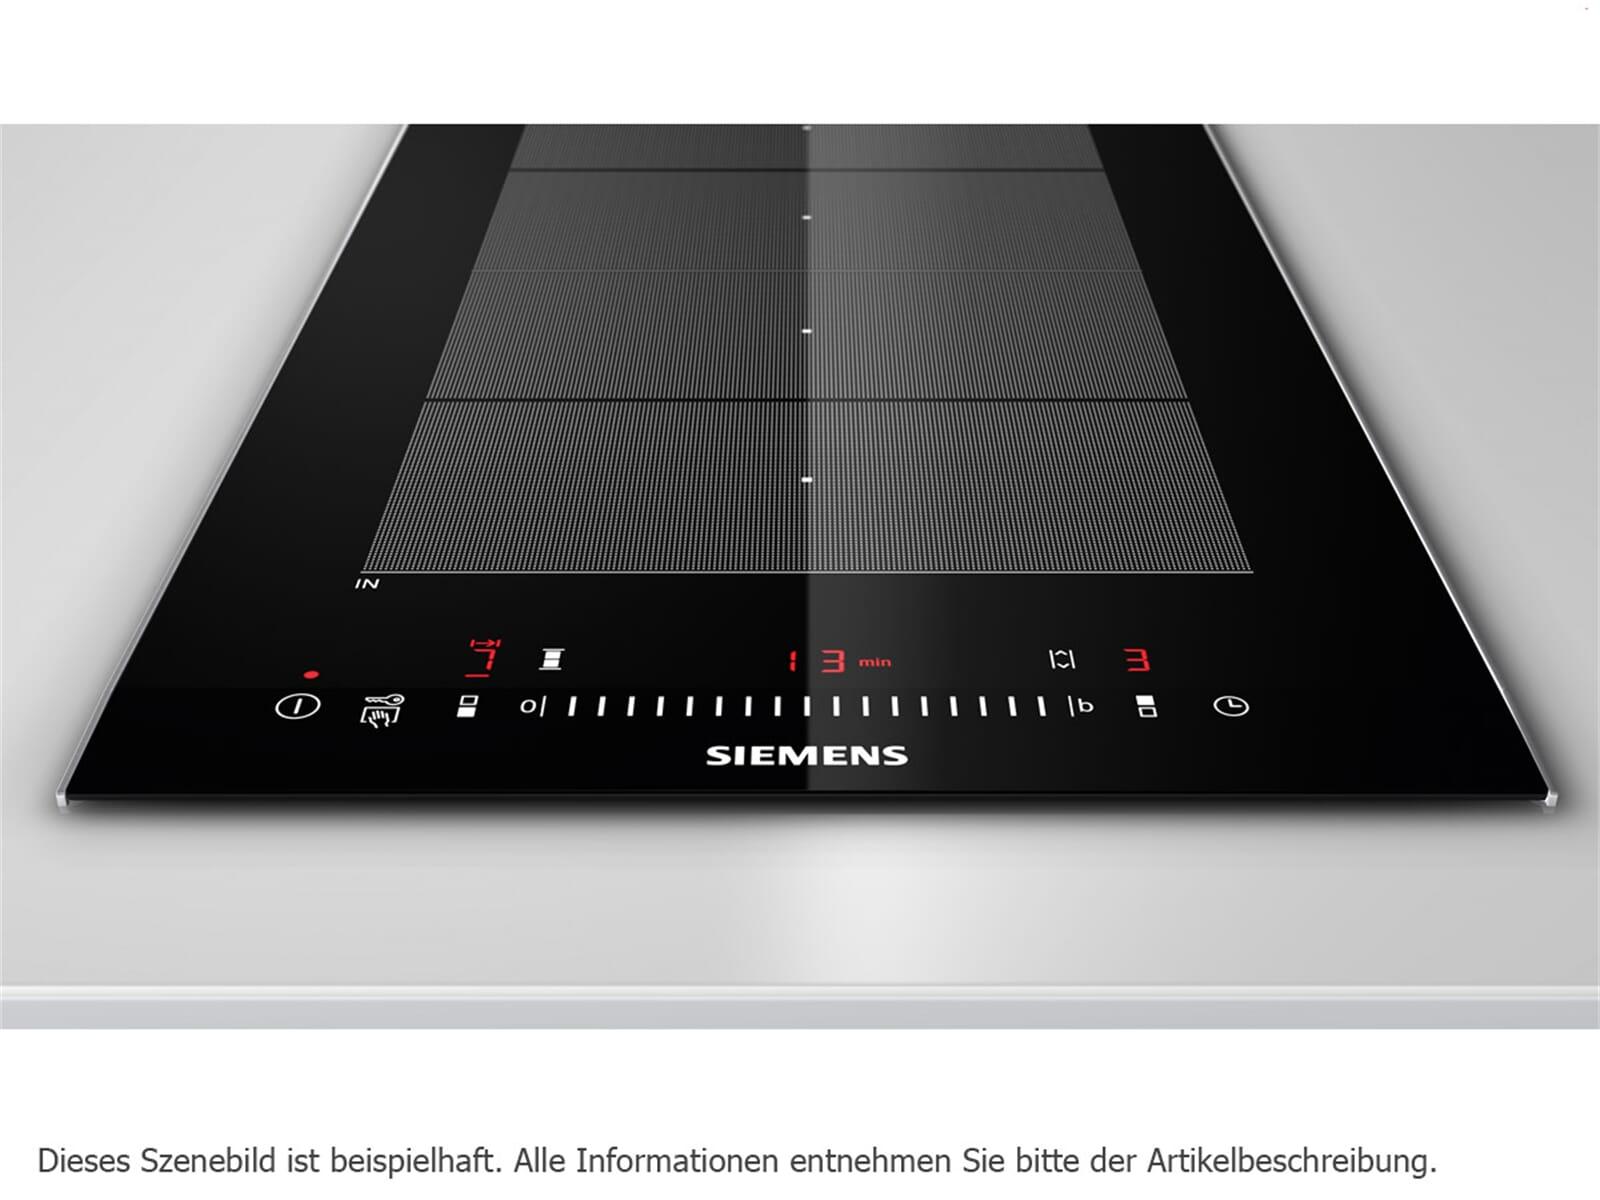 Siemens Ex375fxb1e Domino Induktionskochfeld Autark